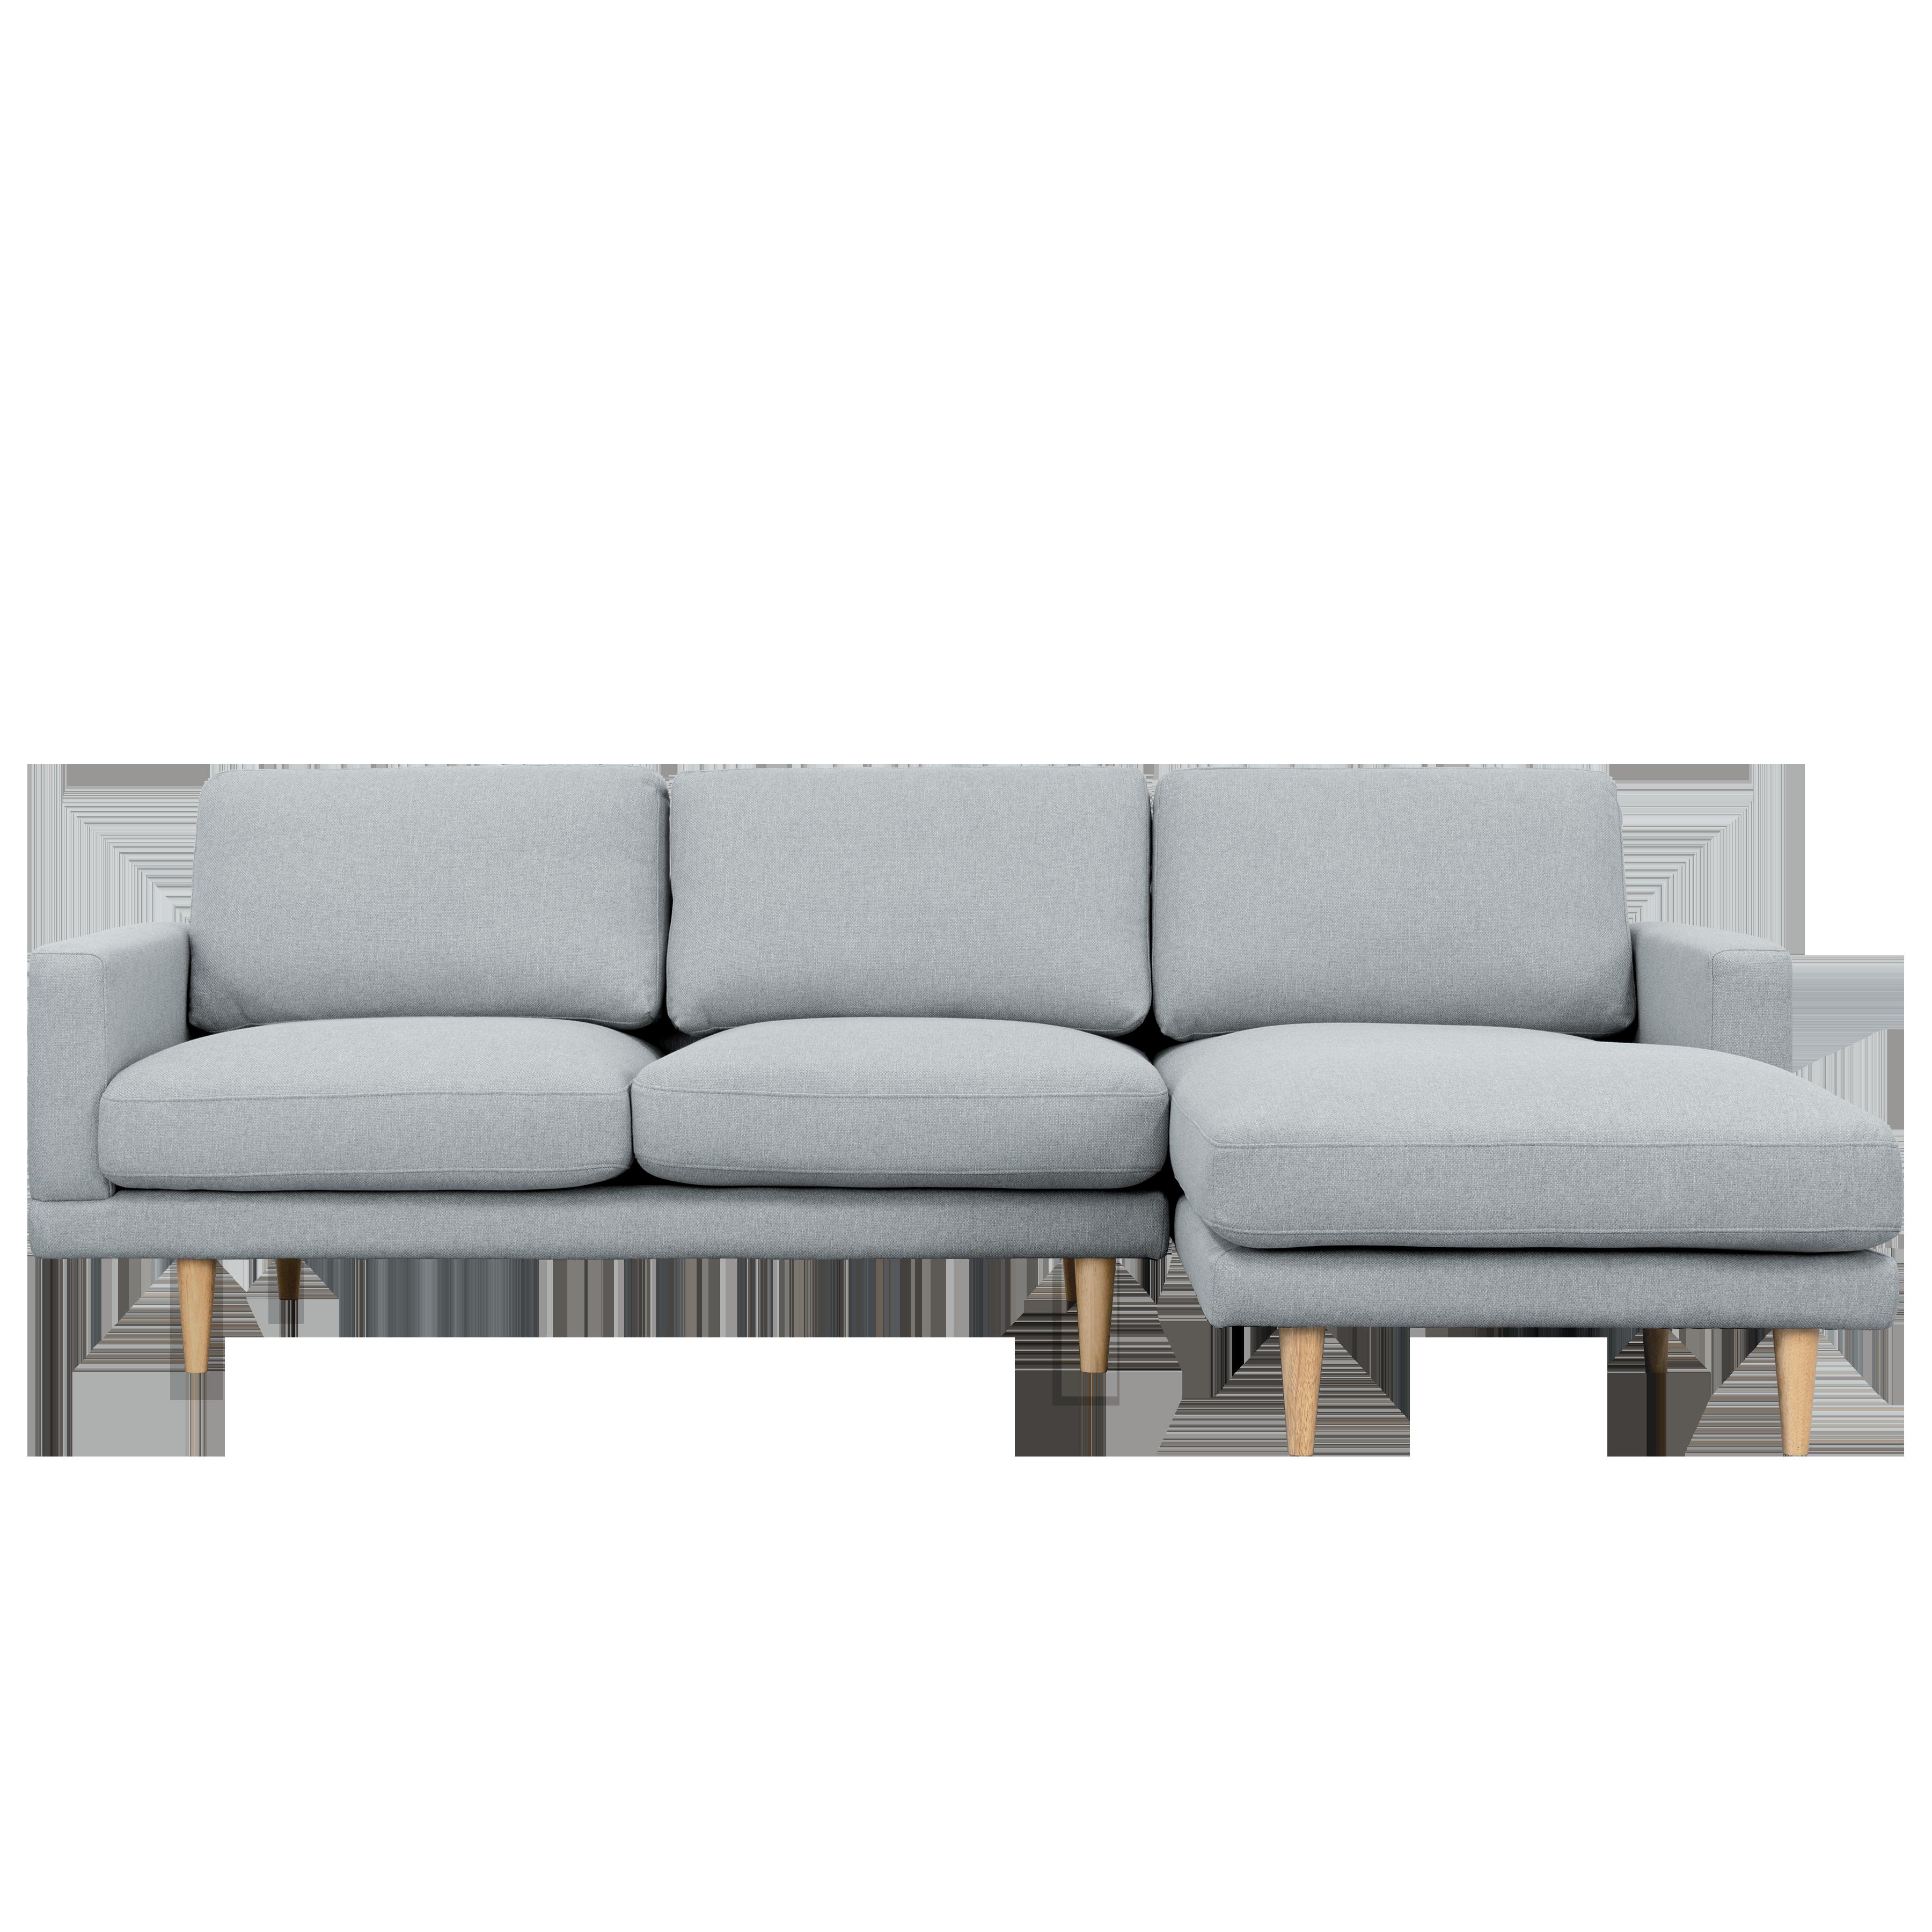 Declan L Shaped Sofa Silver Mist L Shaped Sofa Sofa Elegant Sofa